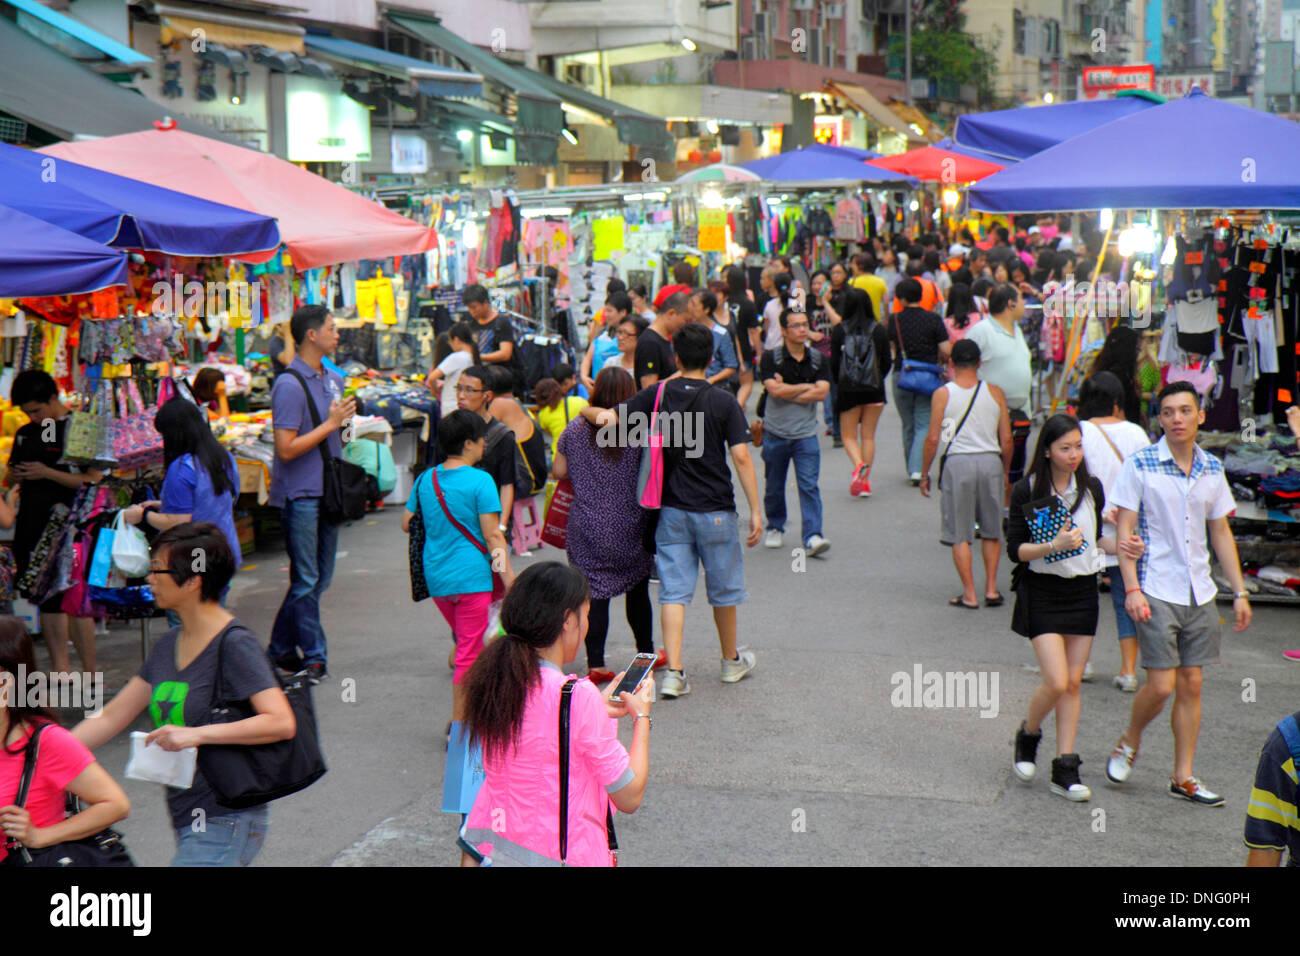 Hong Kong China Kowloon Prince Edward Fa Yuen Street Market shopping pedestrians vendors stalls sale display buying selling Asia - Stock Image